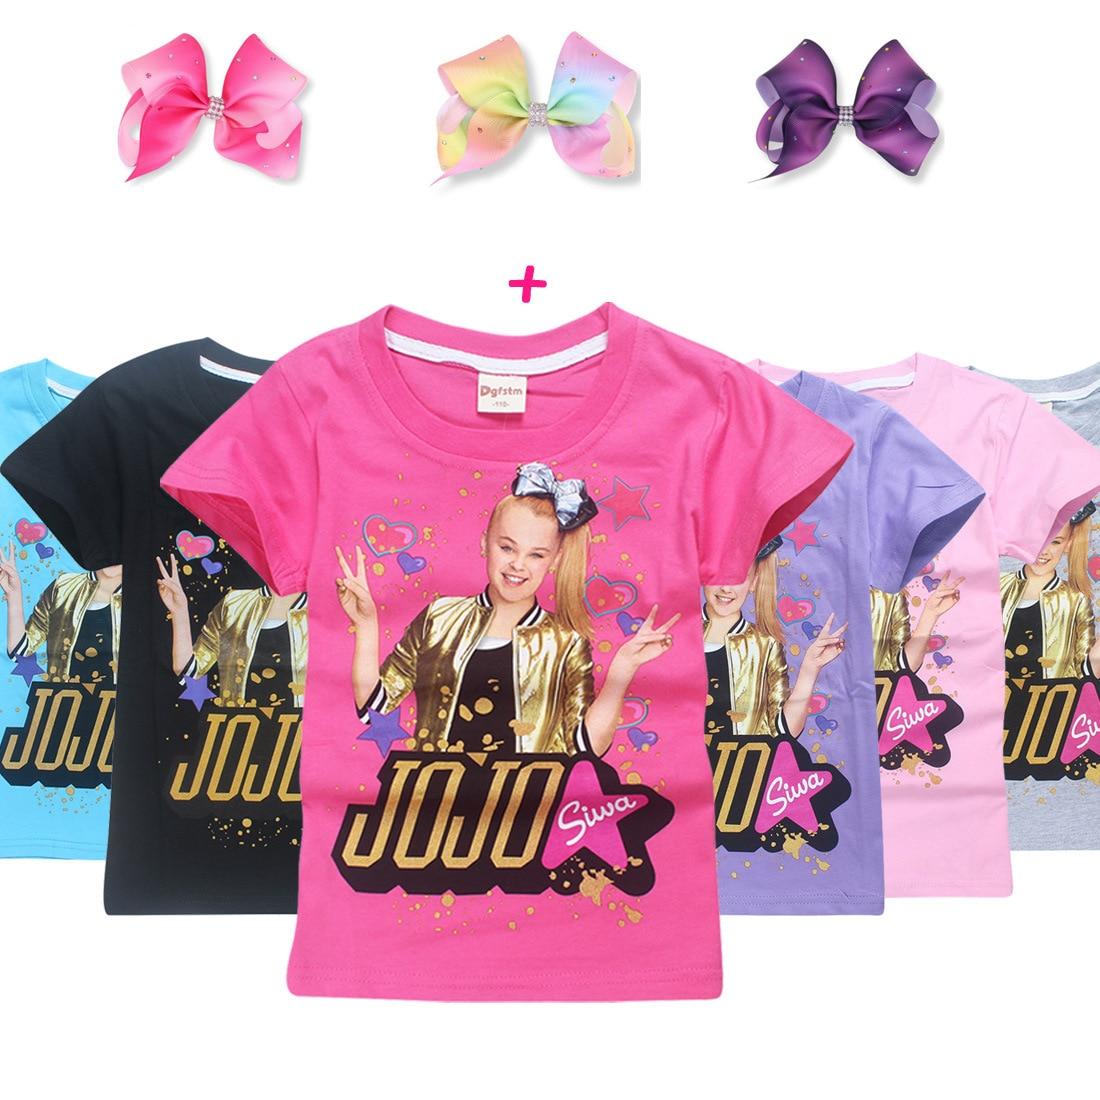 f09e33176 Details about Summer t shirt girls jojo siwa Clothing Short Sleeve T-shirt  +Bow hairband